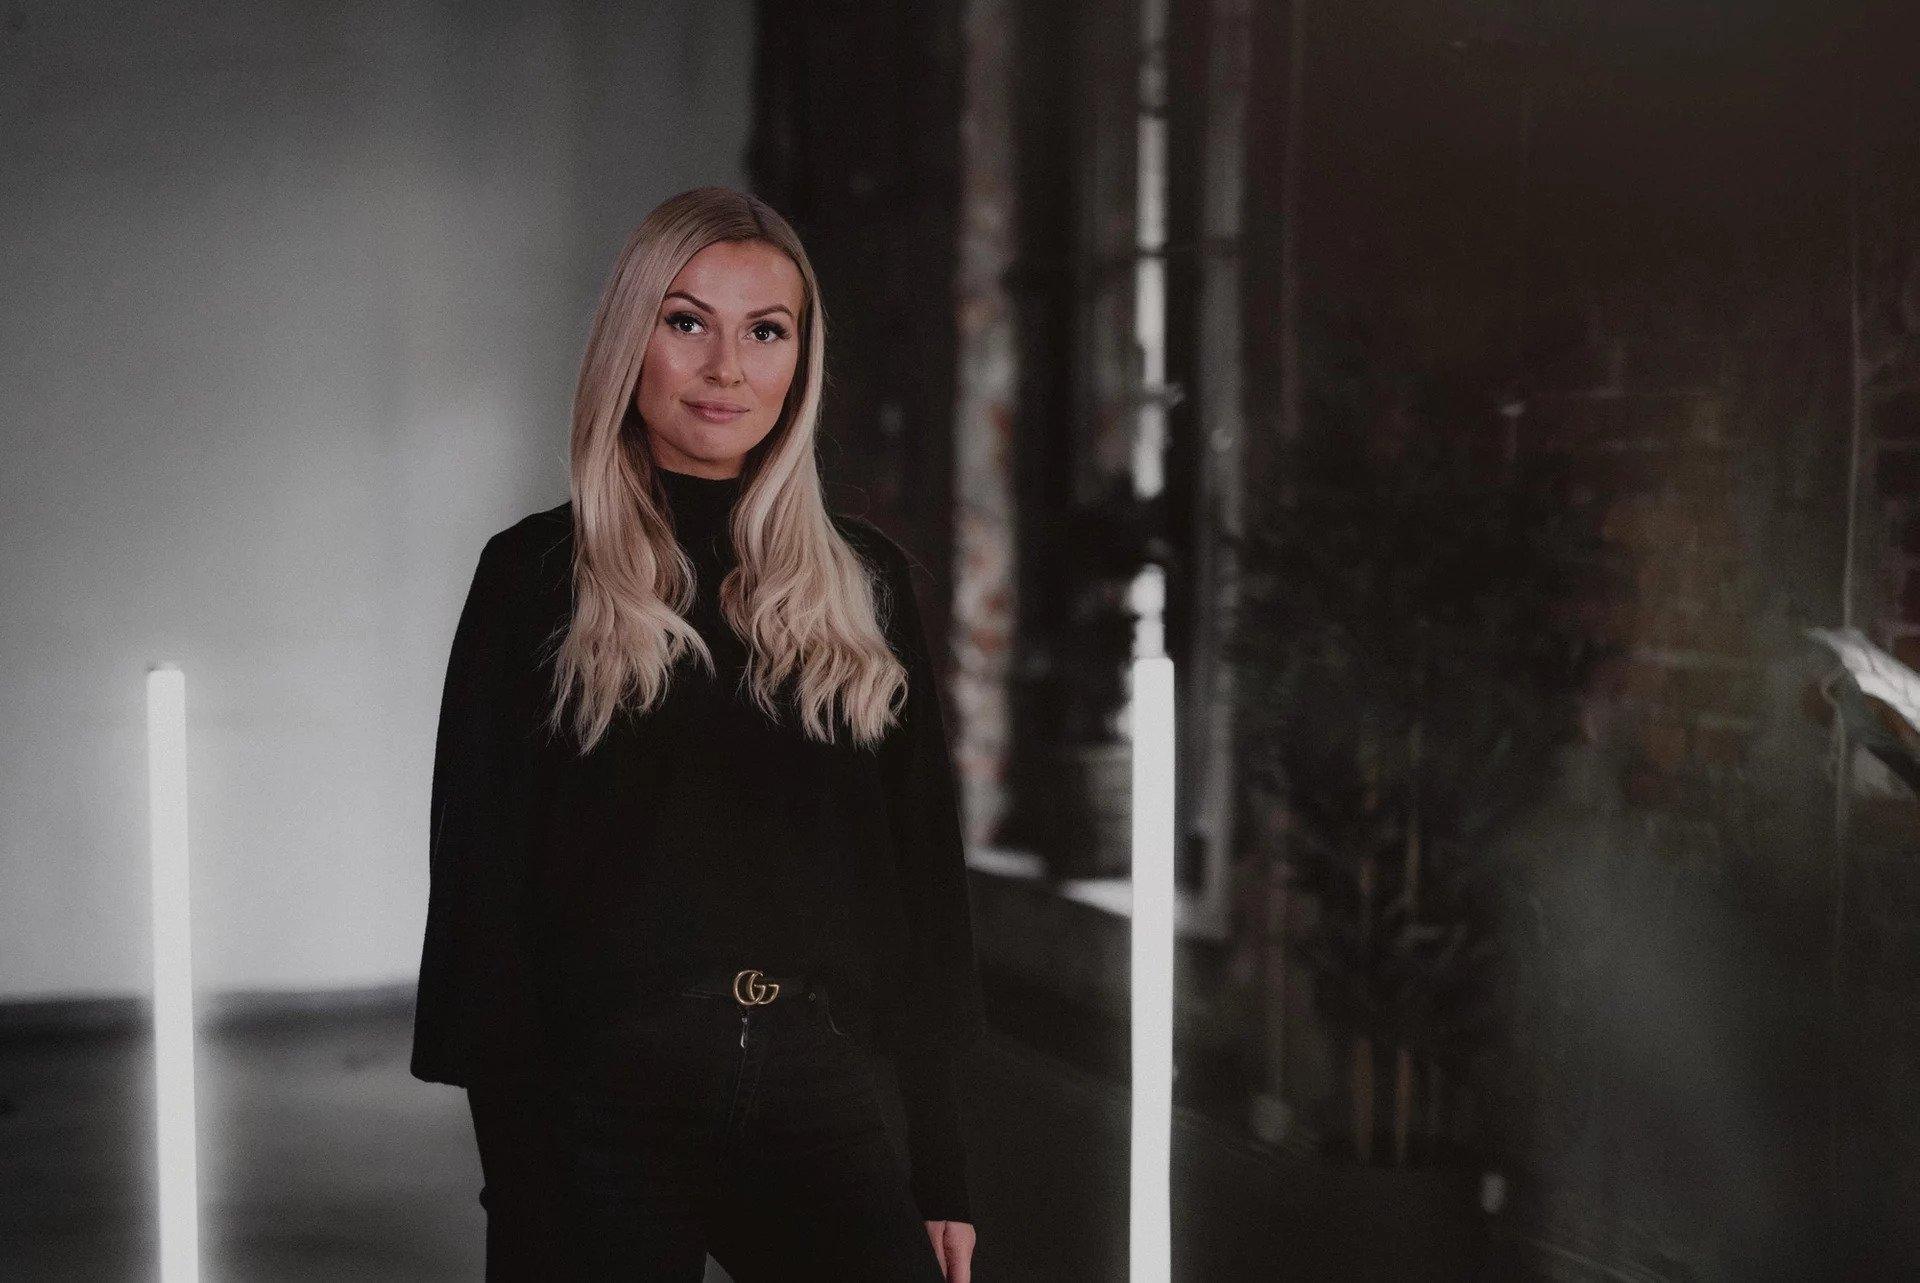 Kristine Meling